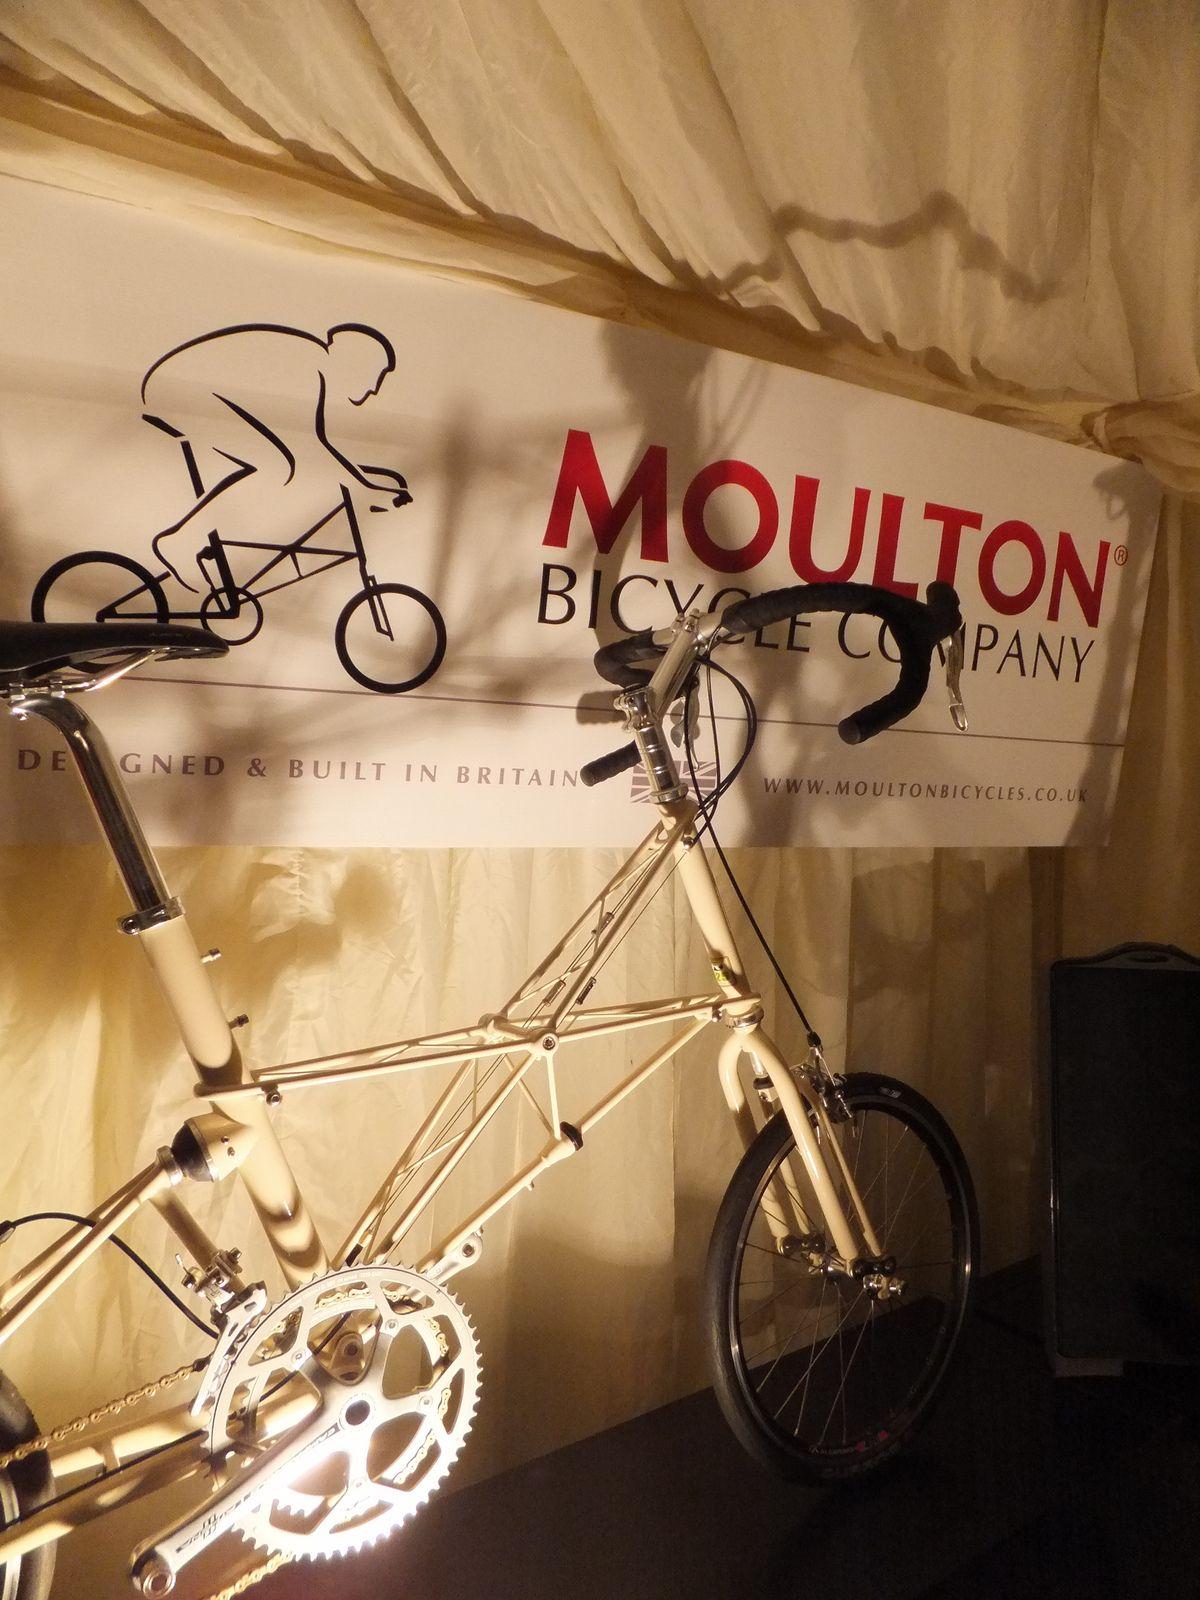 Moulton Bicycle Company Bicycling And Bike Stuff